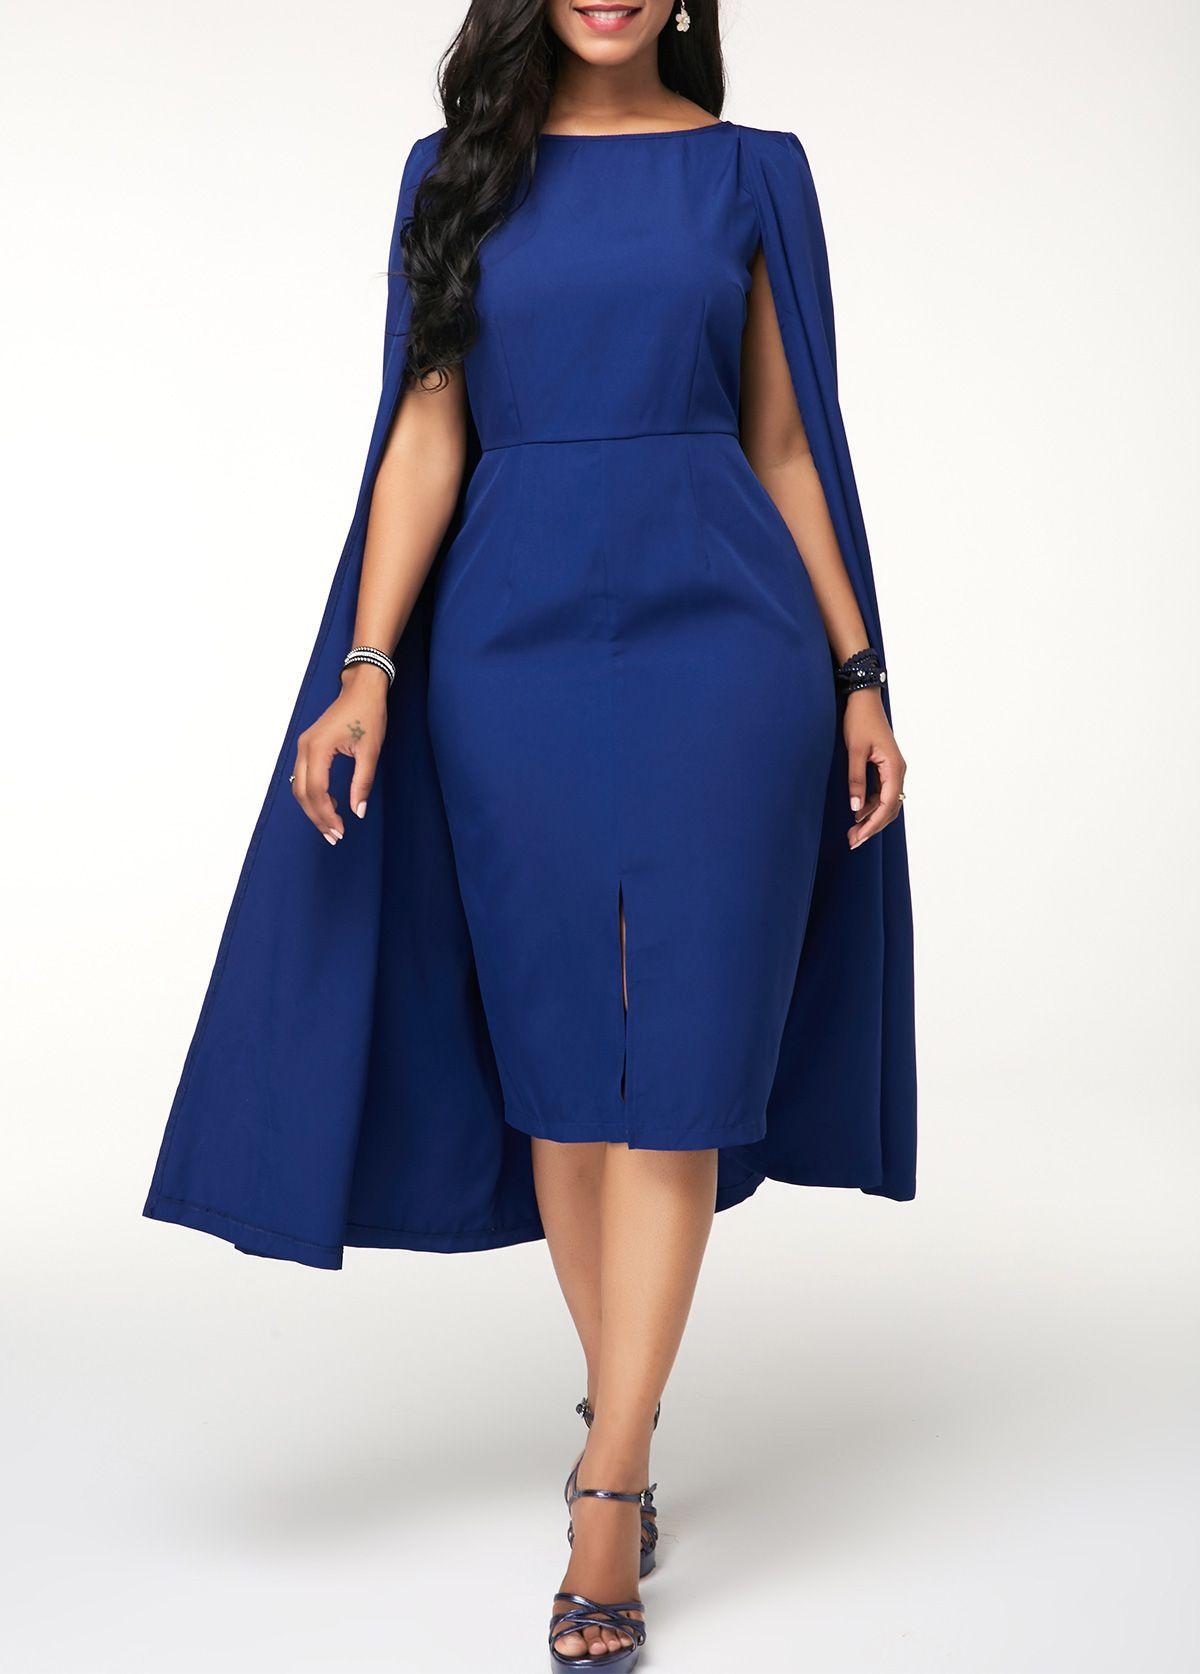 20++ Cape sleeve dress information